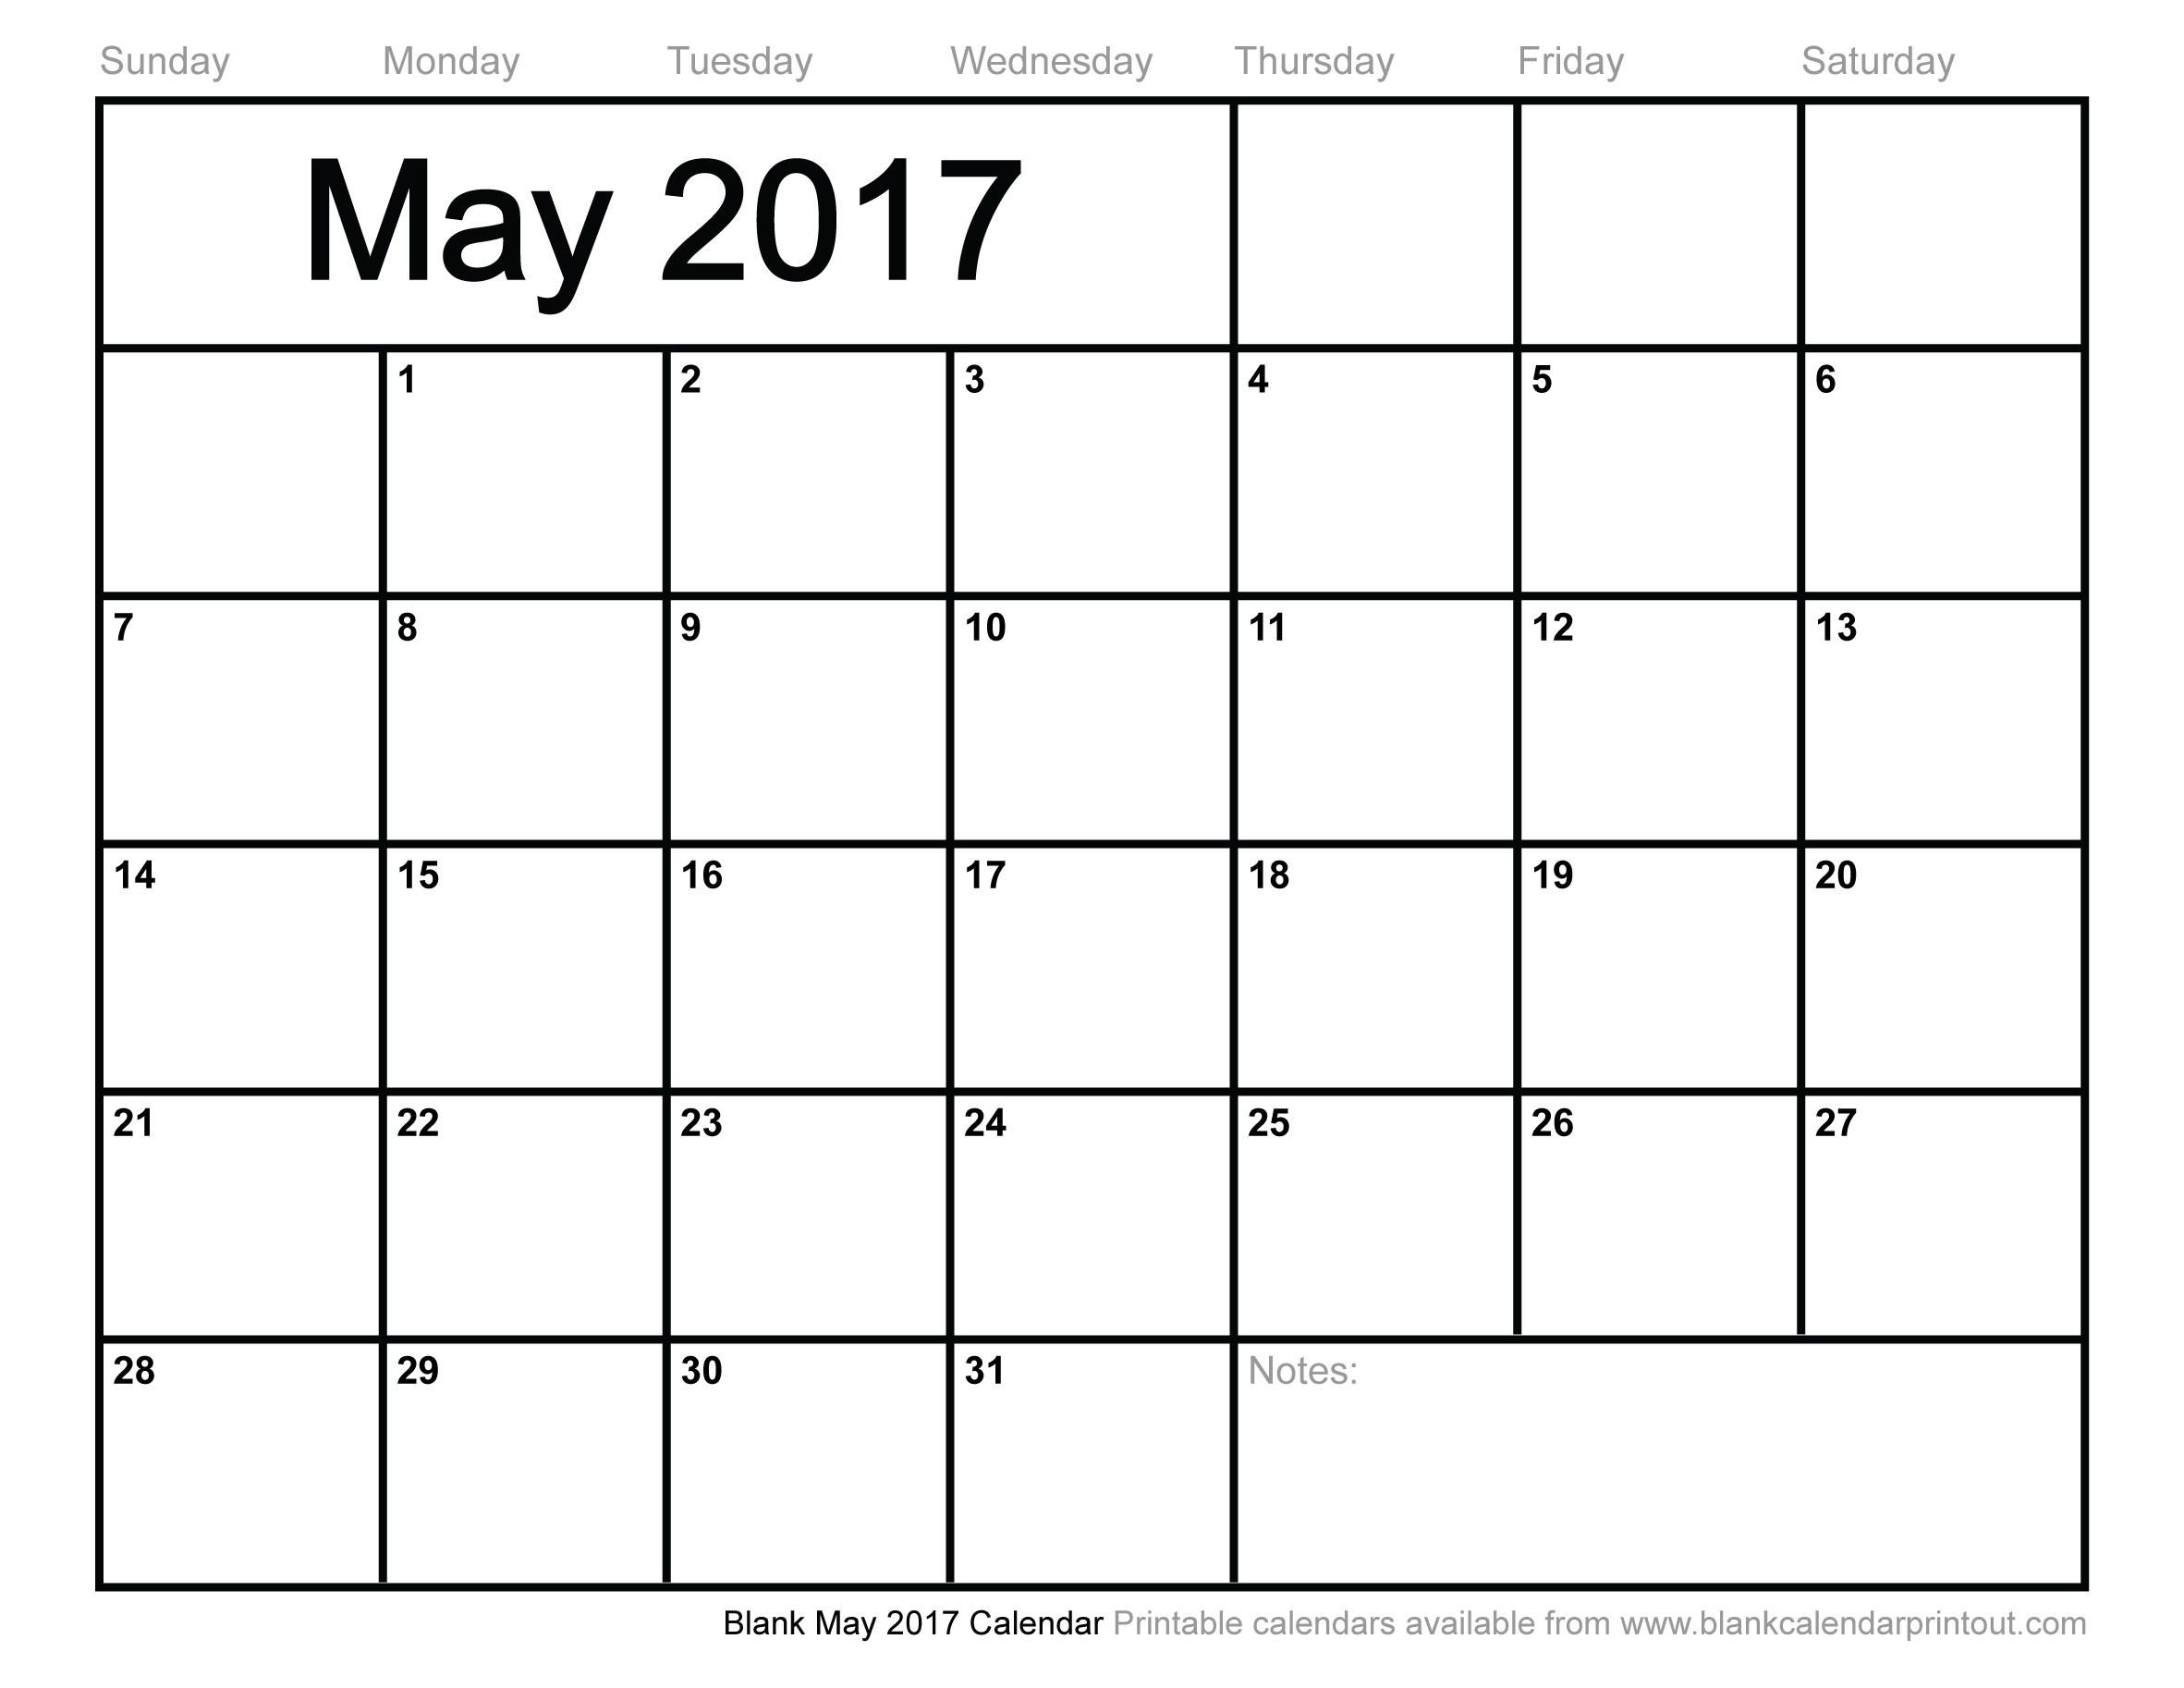 May 2017 Calendar Vertex 3 - Free Printable Calendar, Blank-Calendar Templates By Vertex